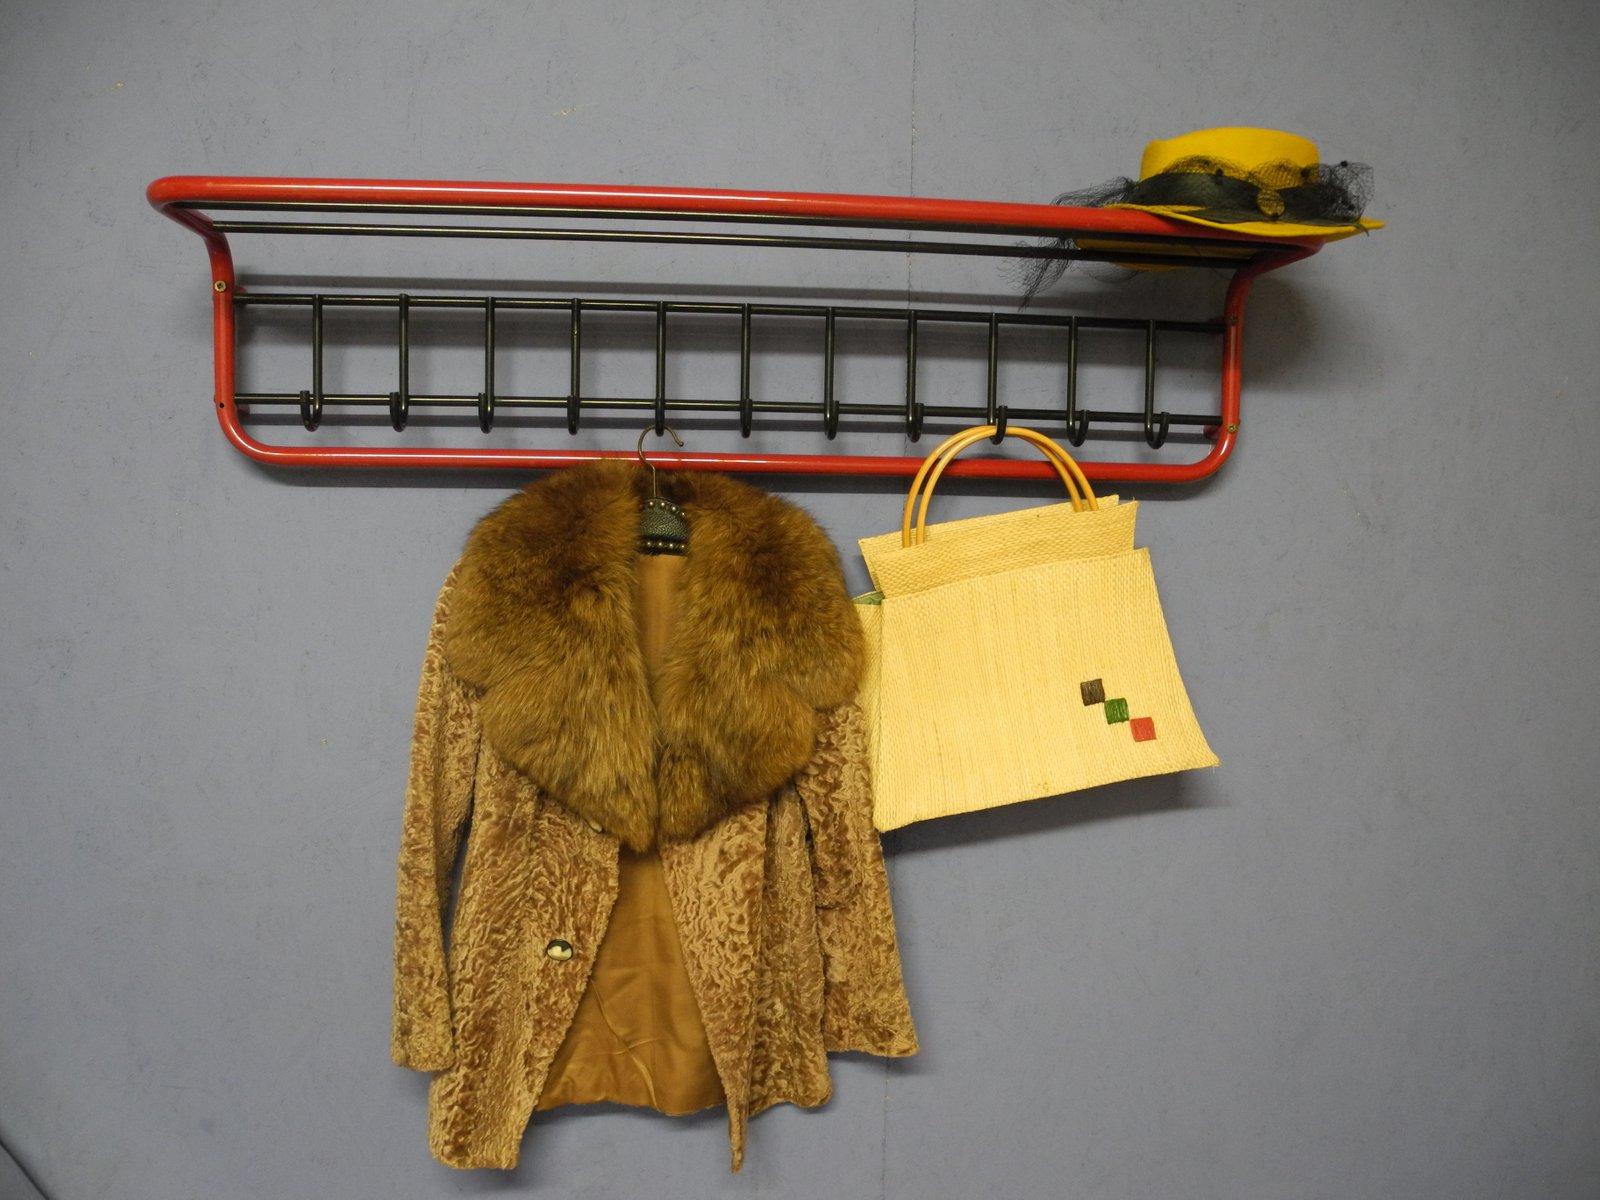 gro e garderobe aus metall in rot schwarz 1980er bei. Black Bedroom Furniture Sets. Home Design Ideas